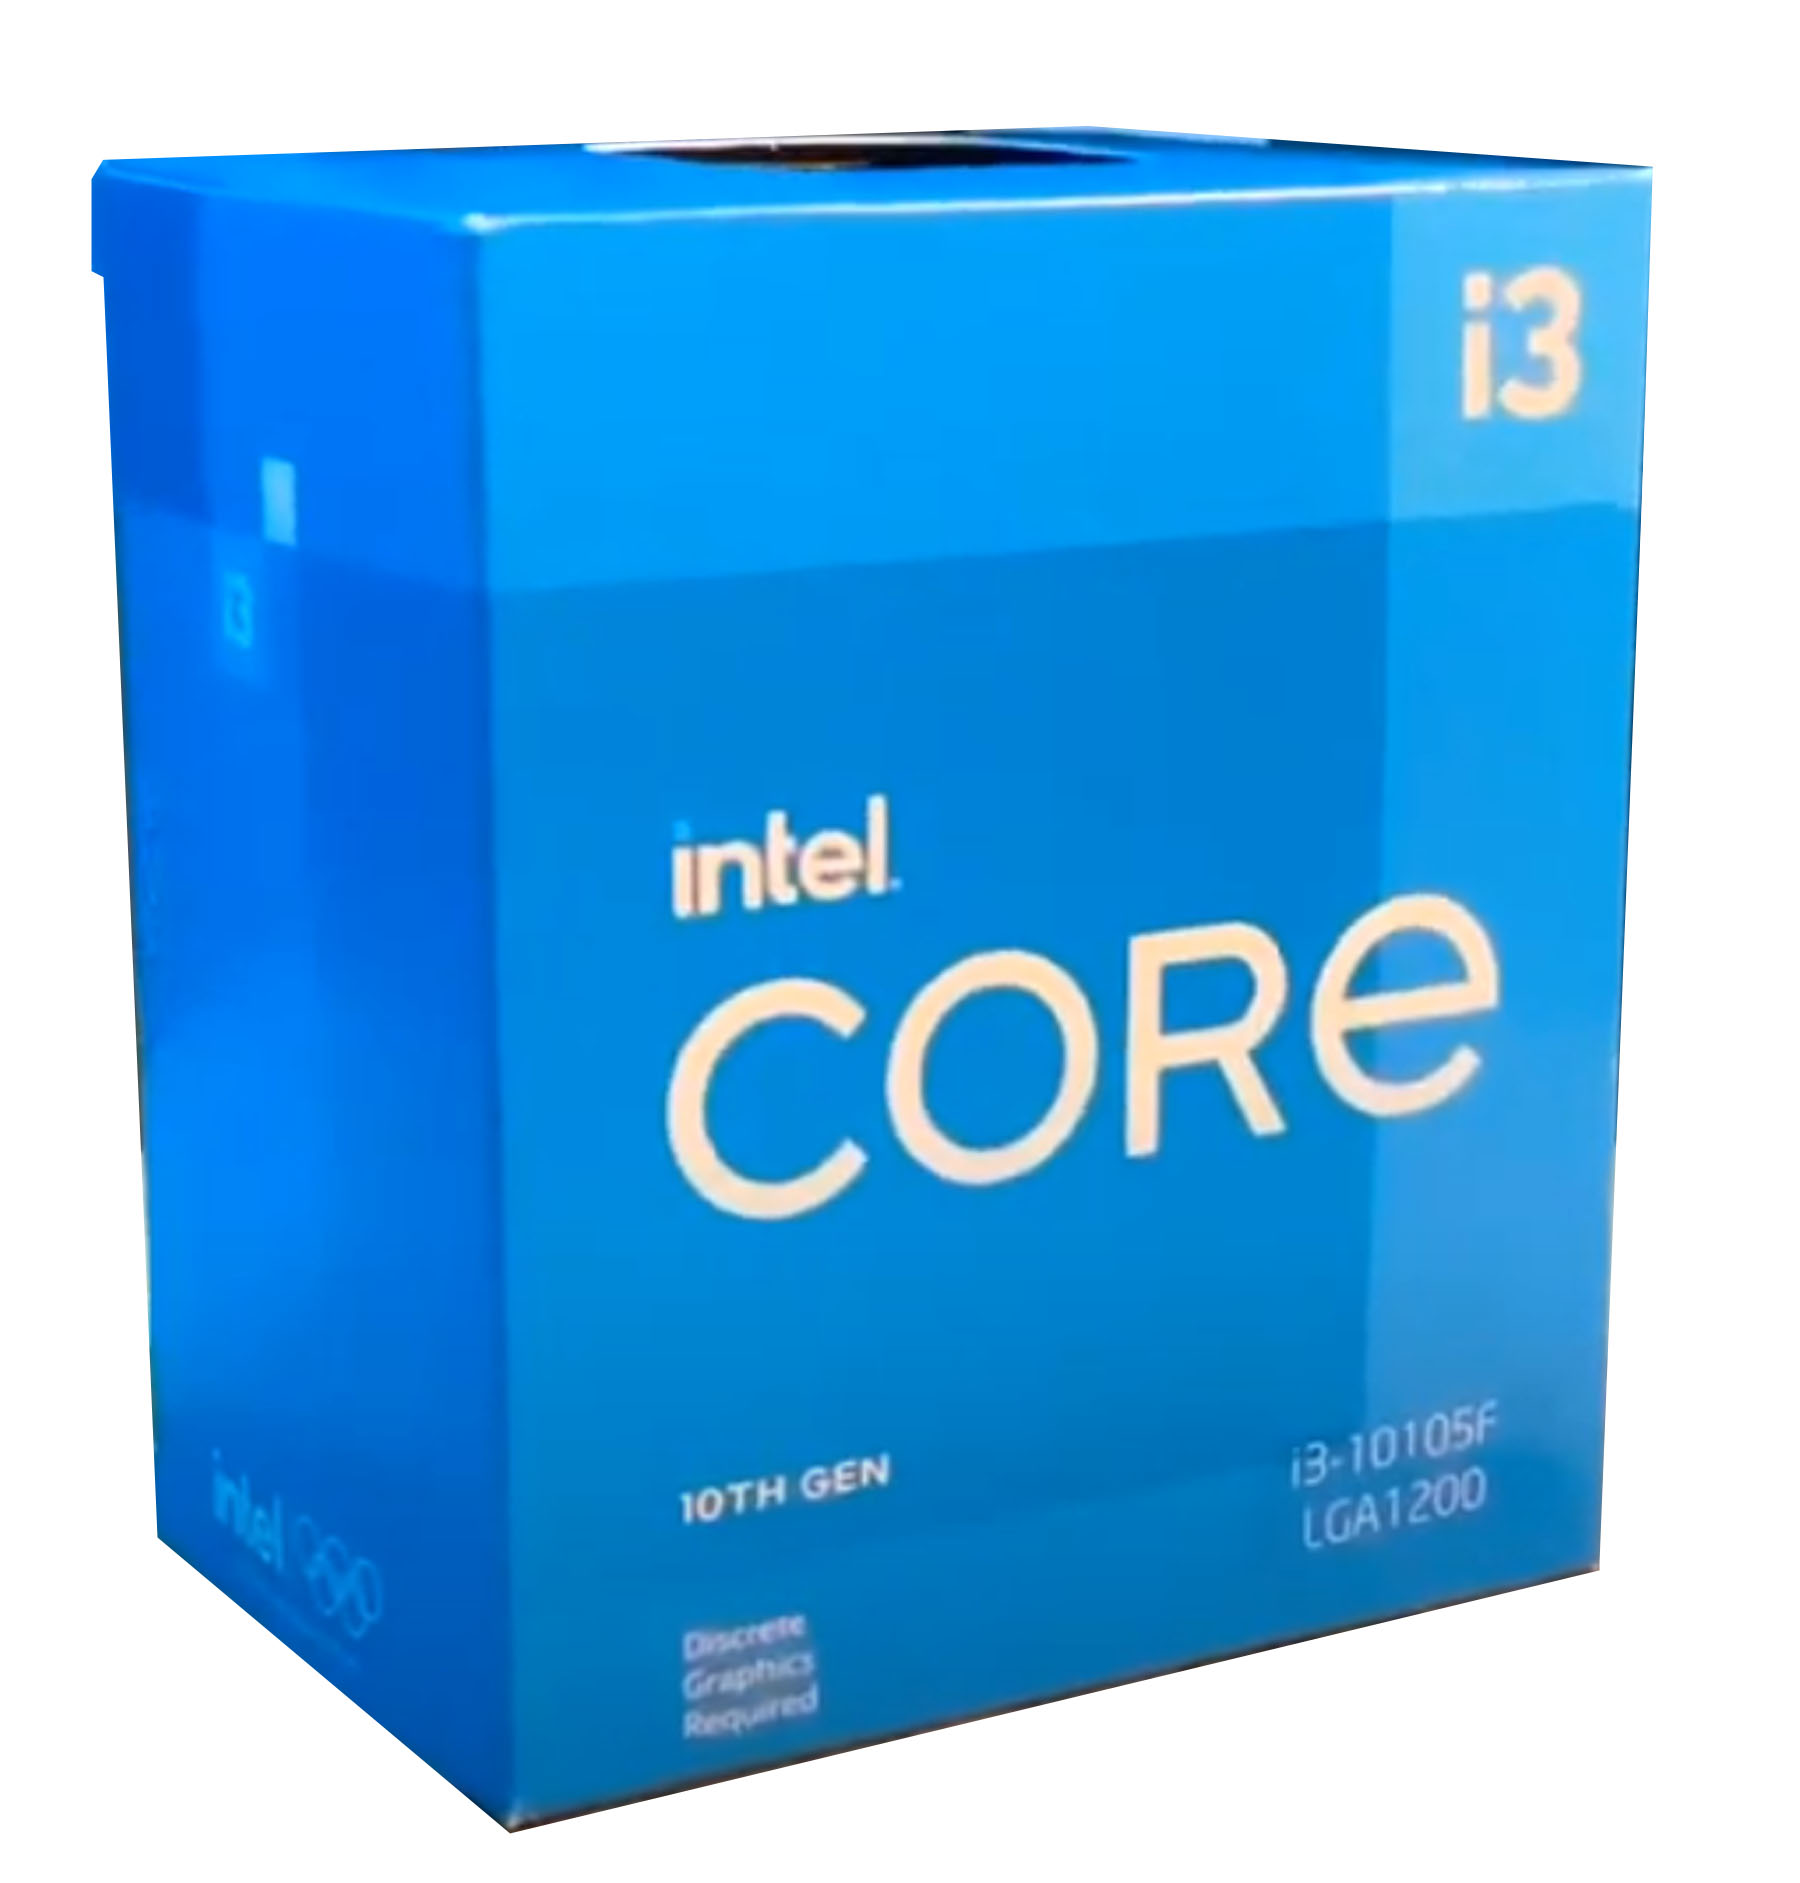 CPU Intel Core i3-10105F BOX (3.7GHz, LGA1200)